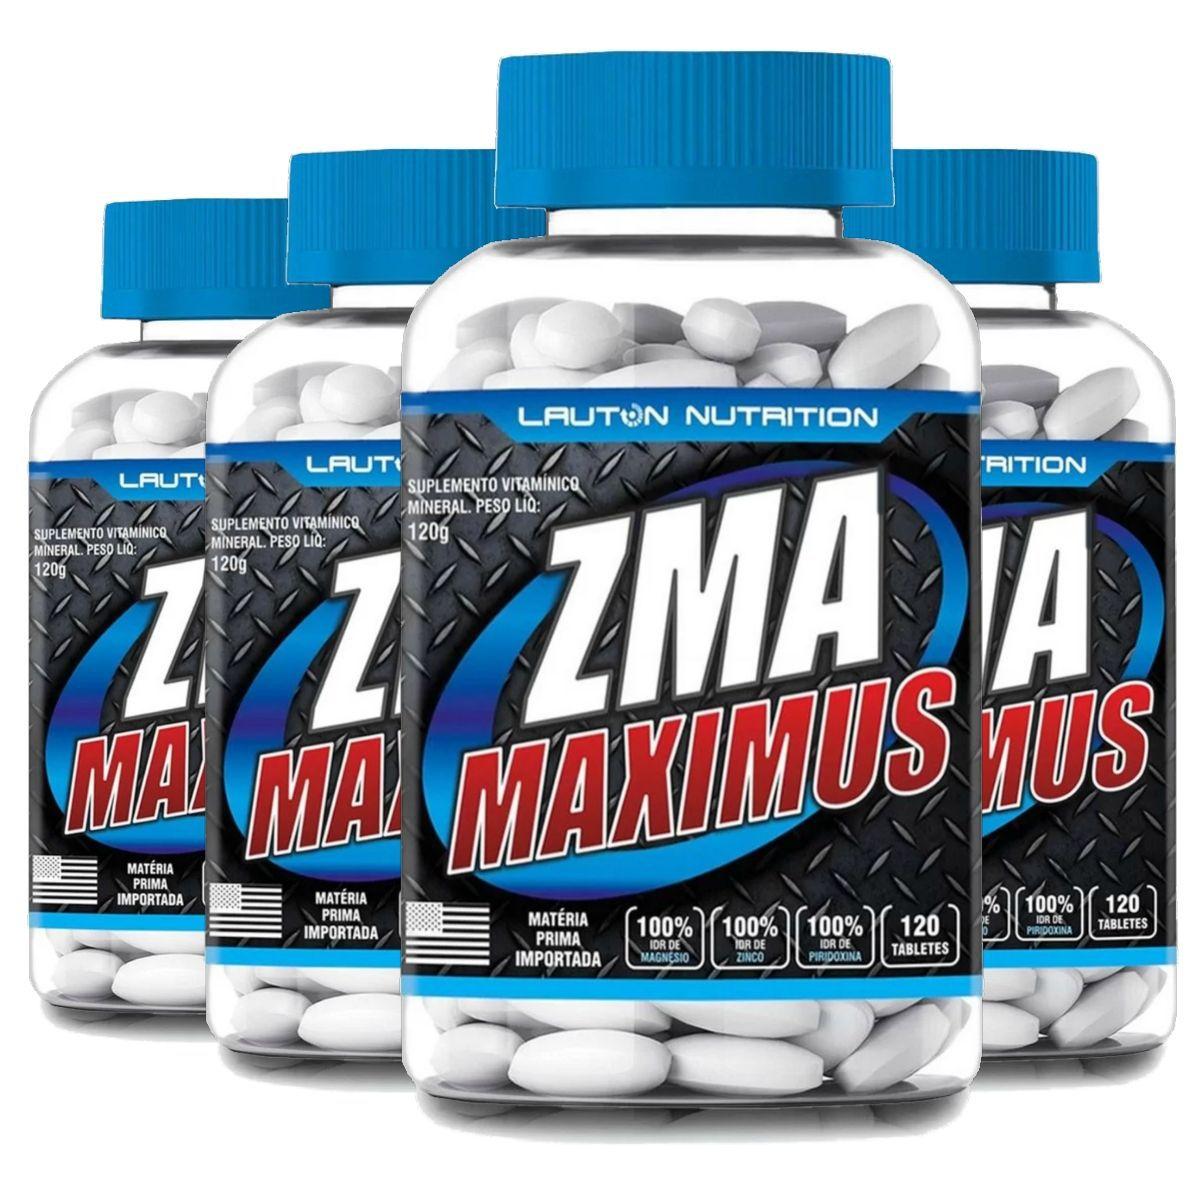 Kit 4 ZMA Maximus Lauton Nutrition - 120 Tablets 1G